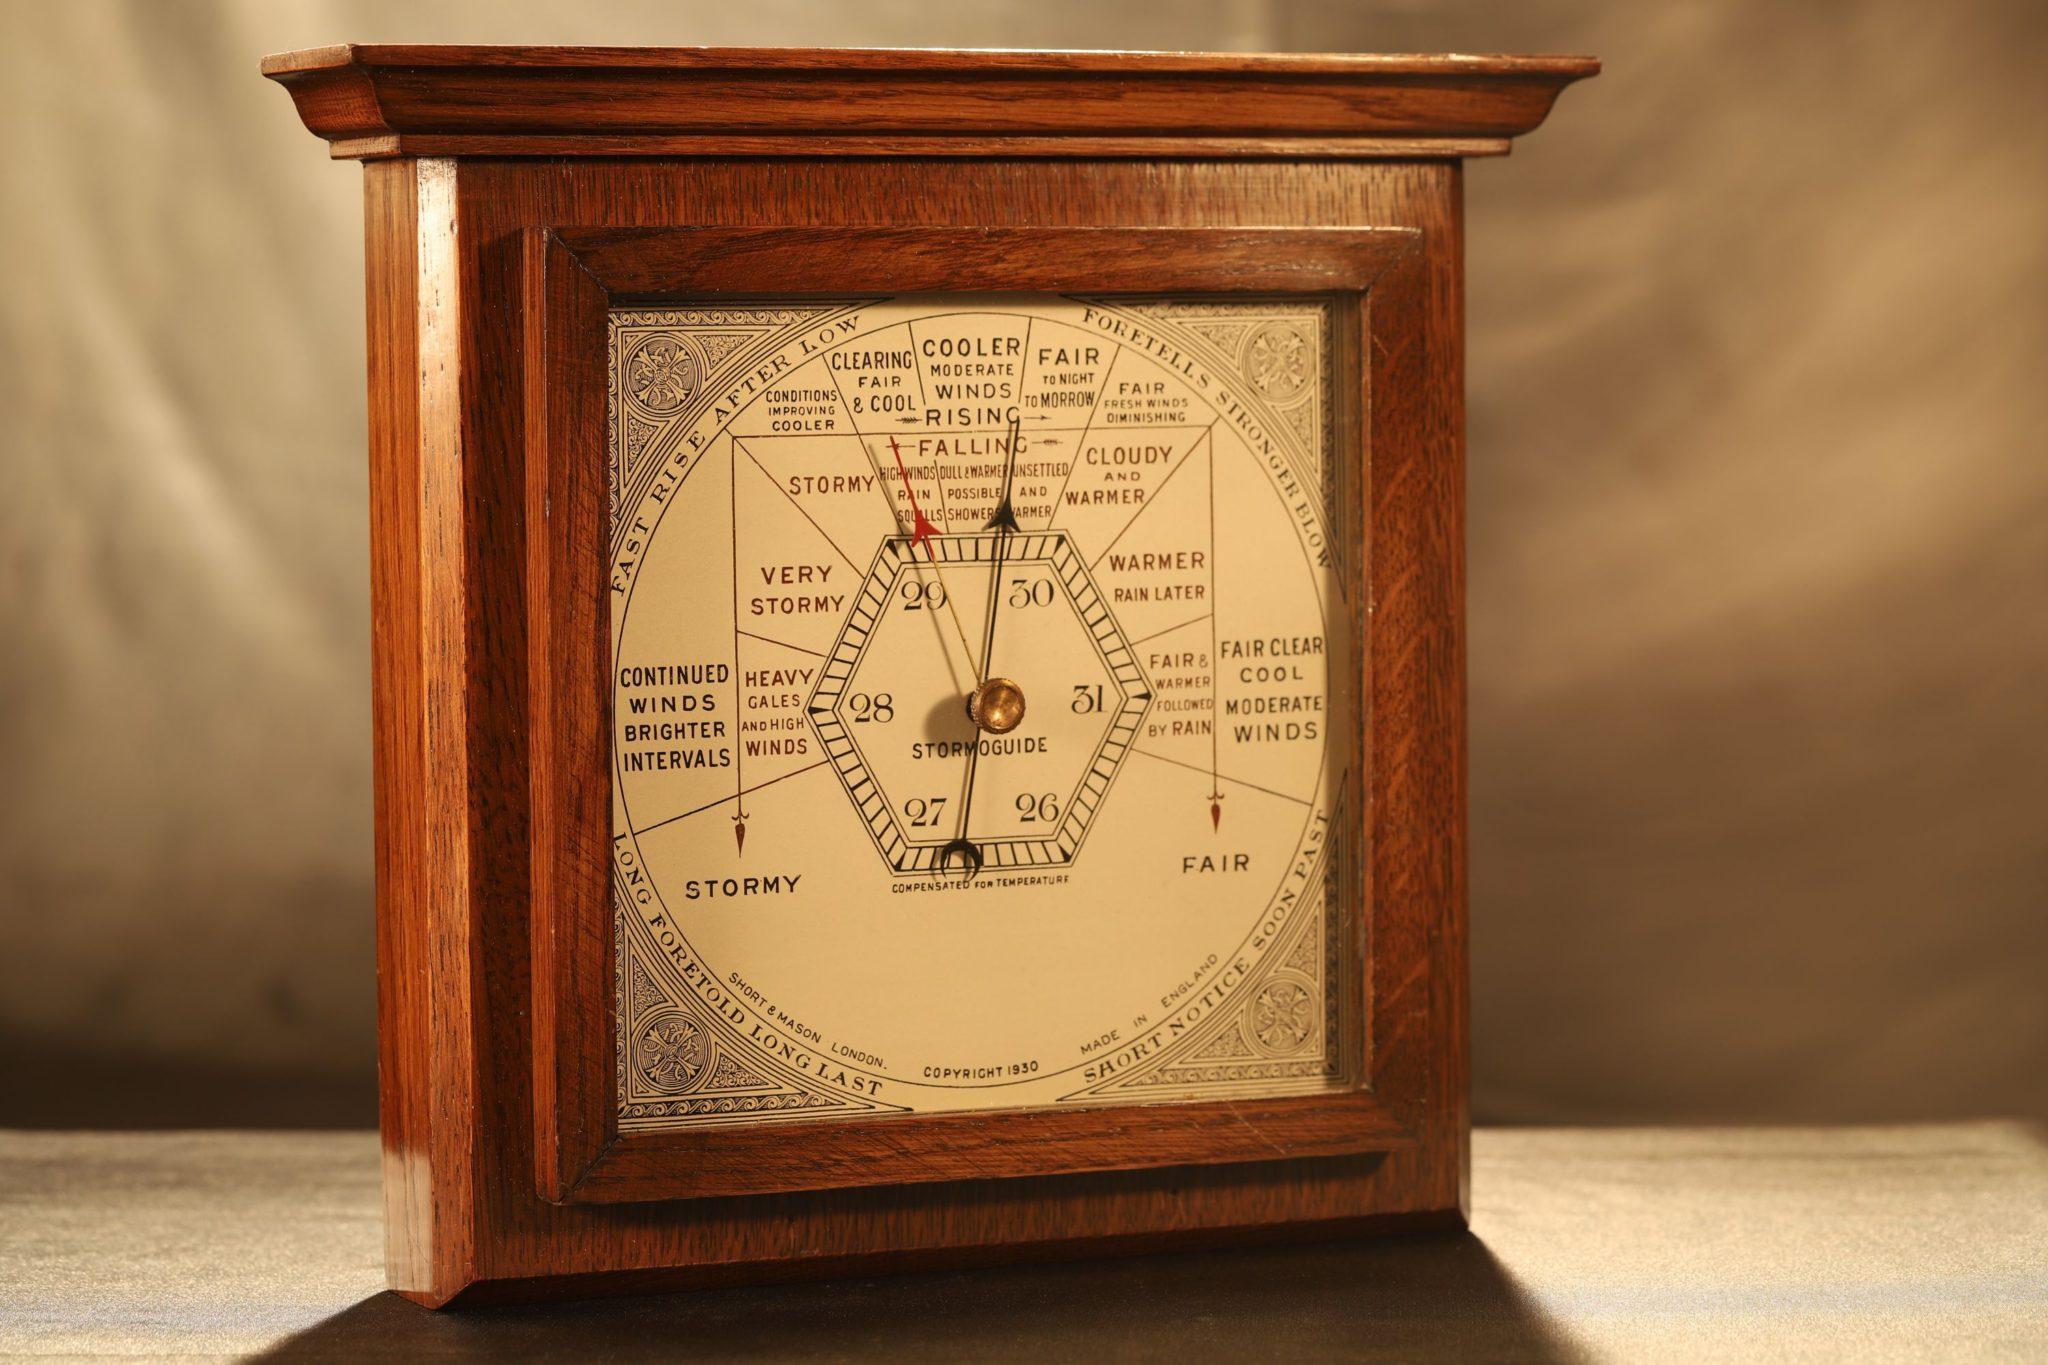 Image of Short & Mason Stormoguide Barometer c1930